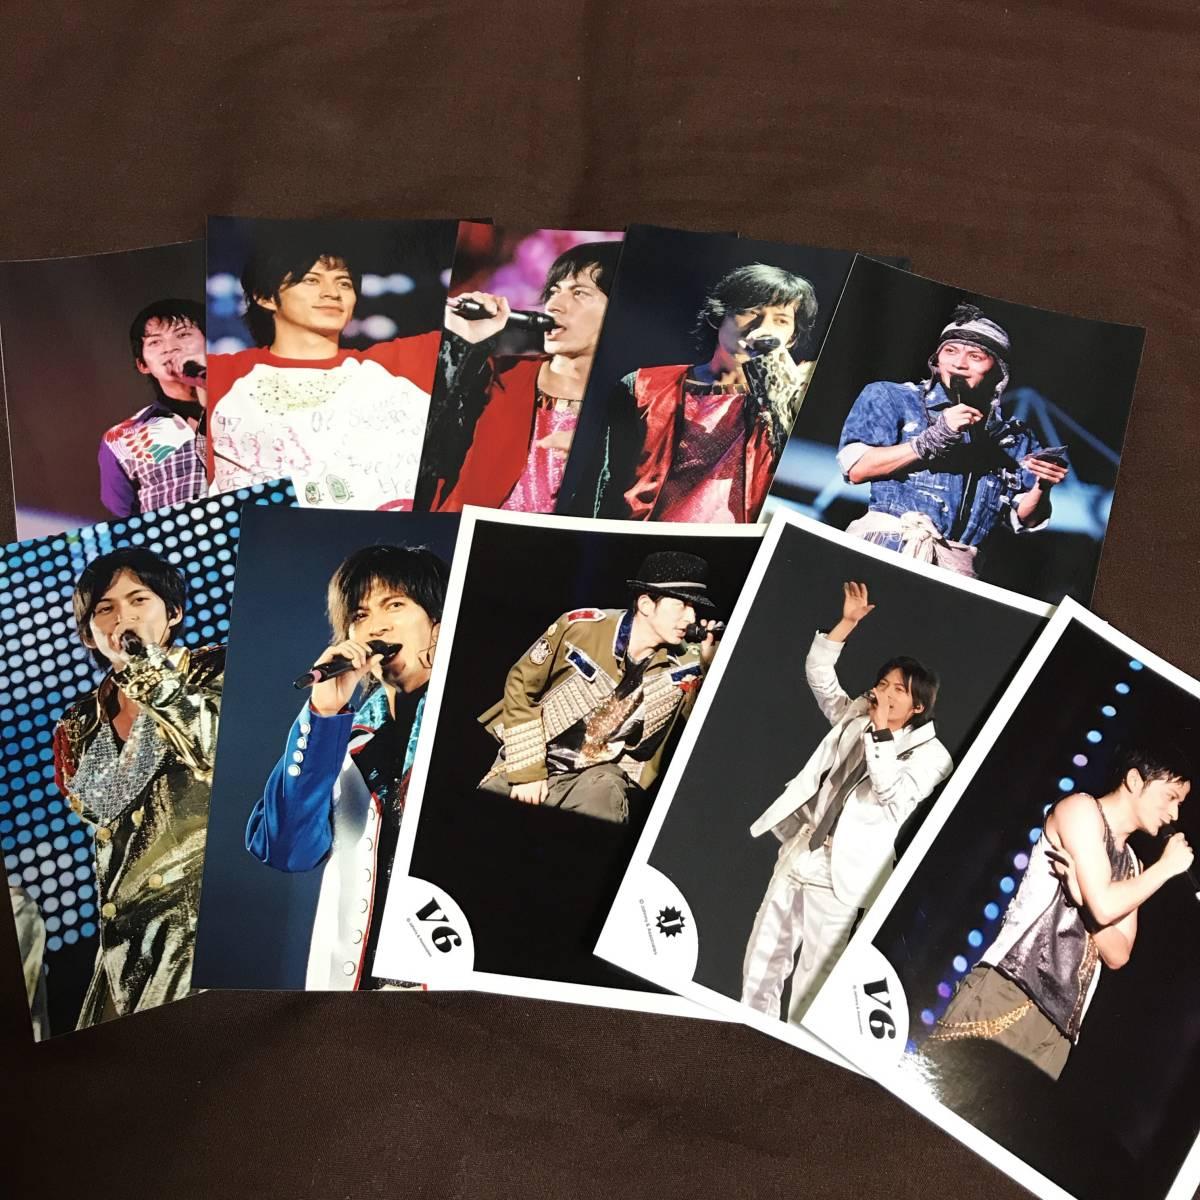 V6 岡田准一 公式写真 写真 ブロマイド グッズ ⑤ コンサートグッズの画像